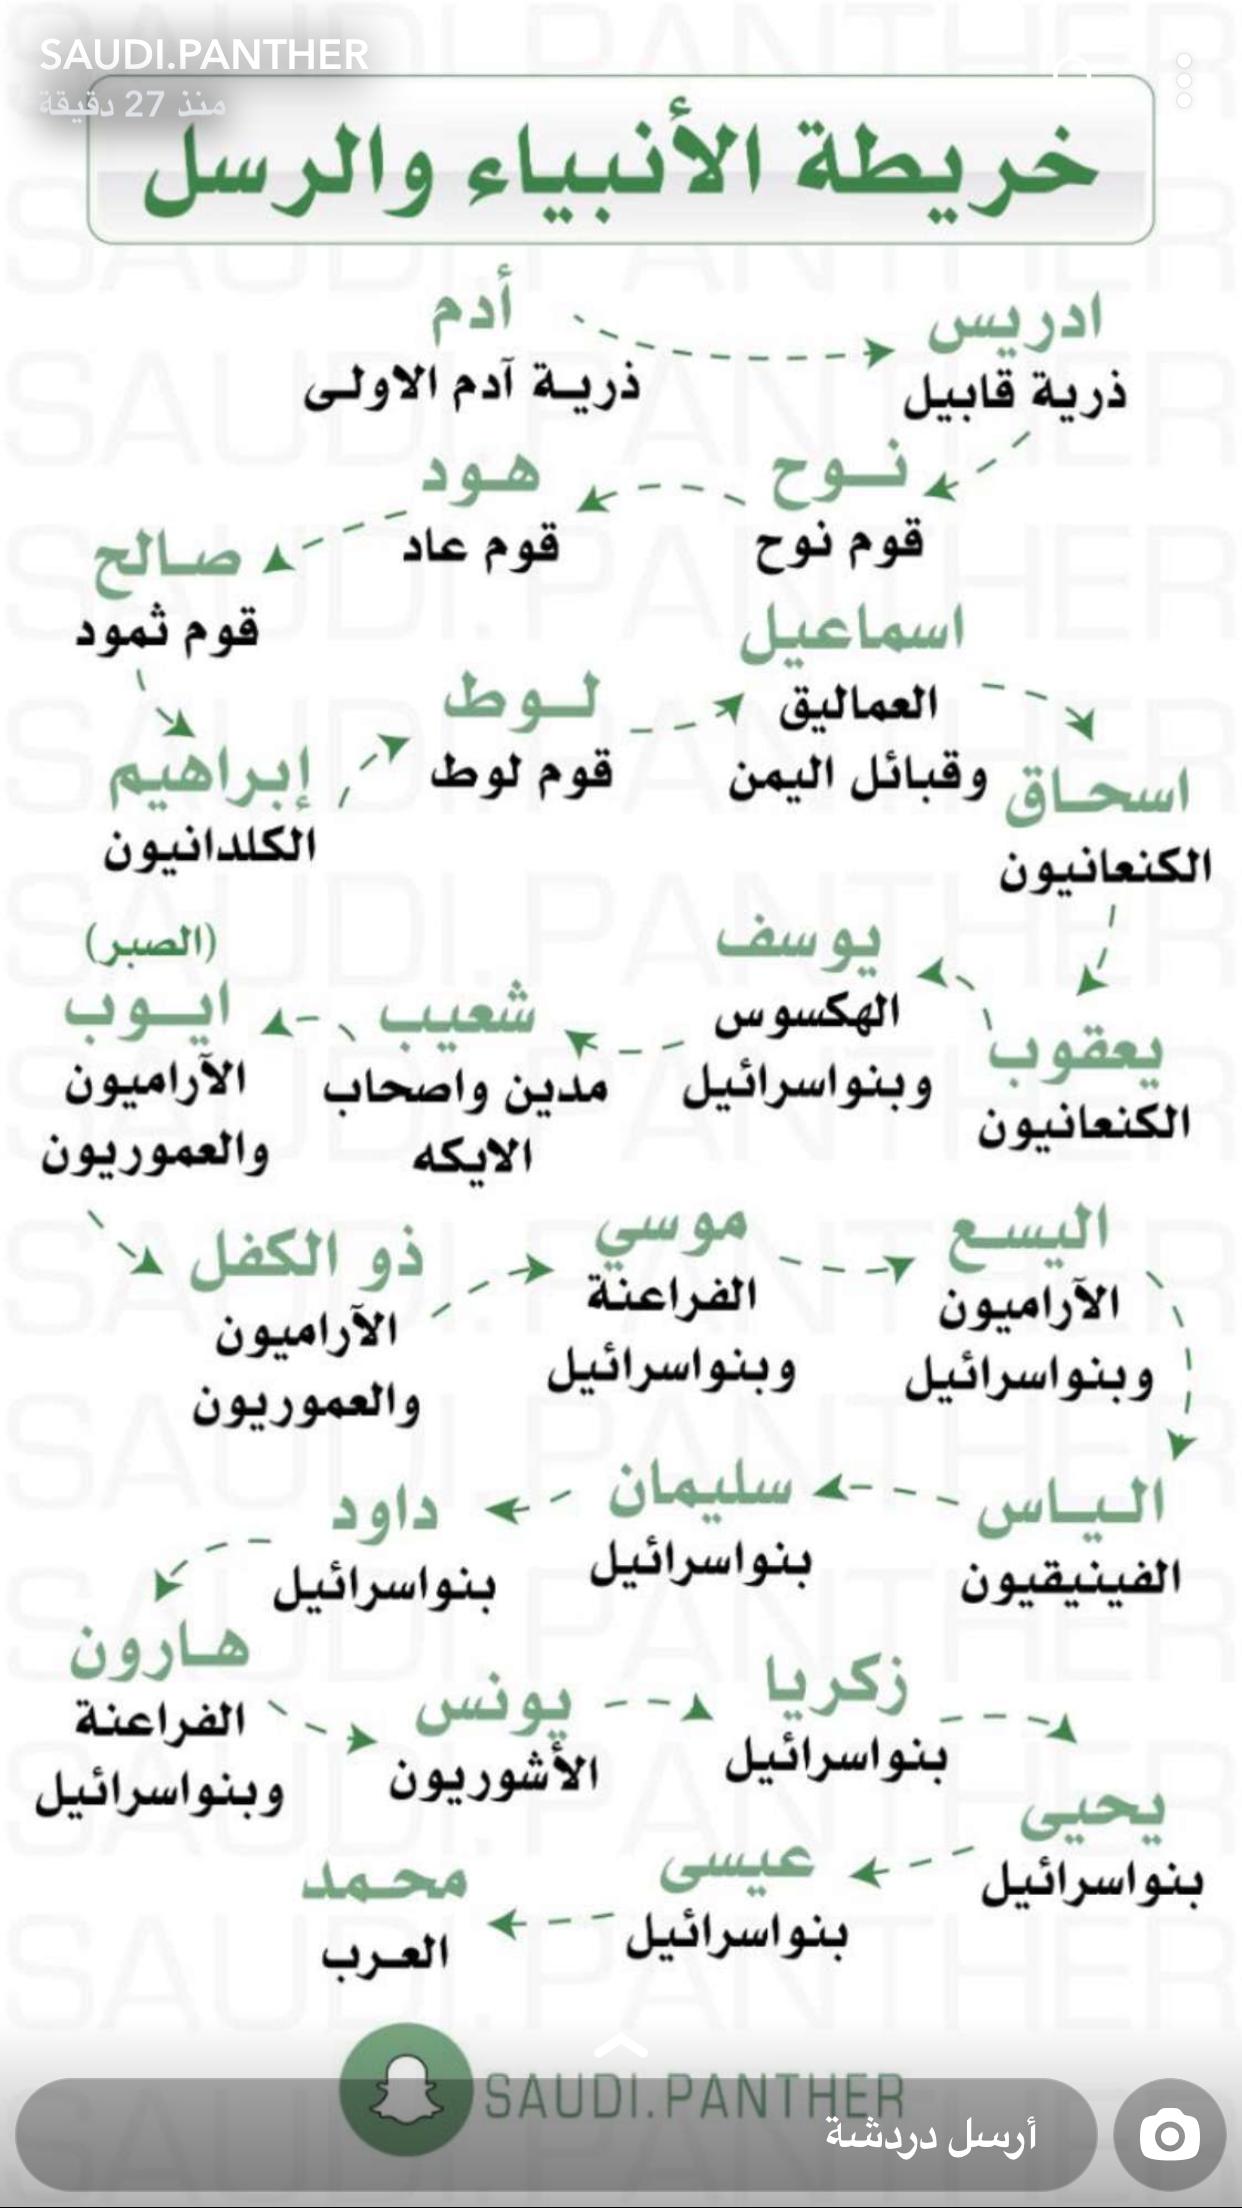 Pin By Nour Ahmad On أدعية Quran Quotes Love Islamic Quotes Quran Islamic Phrases